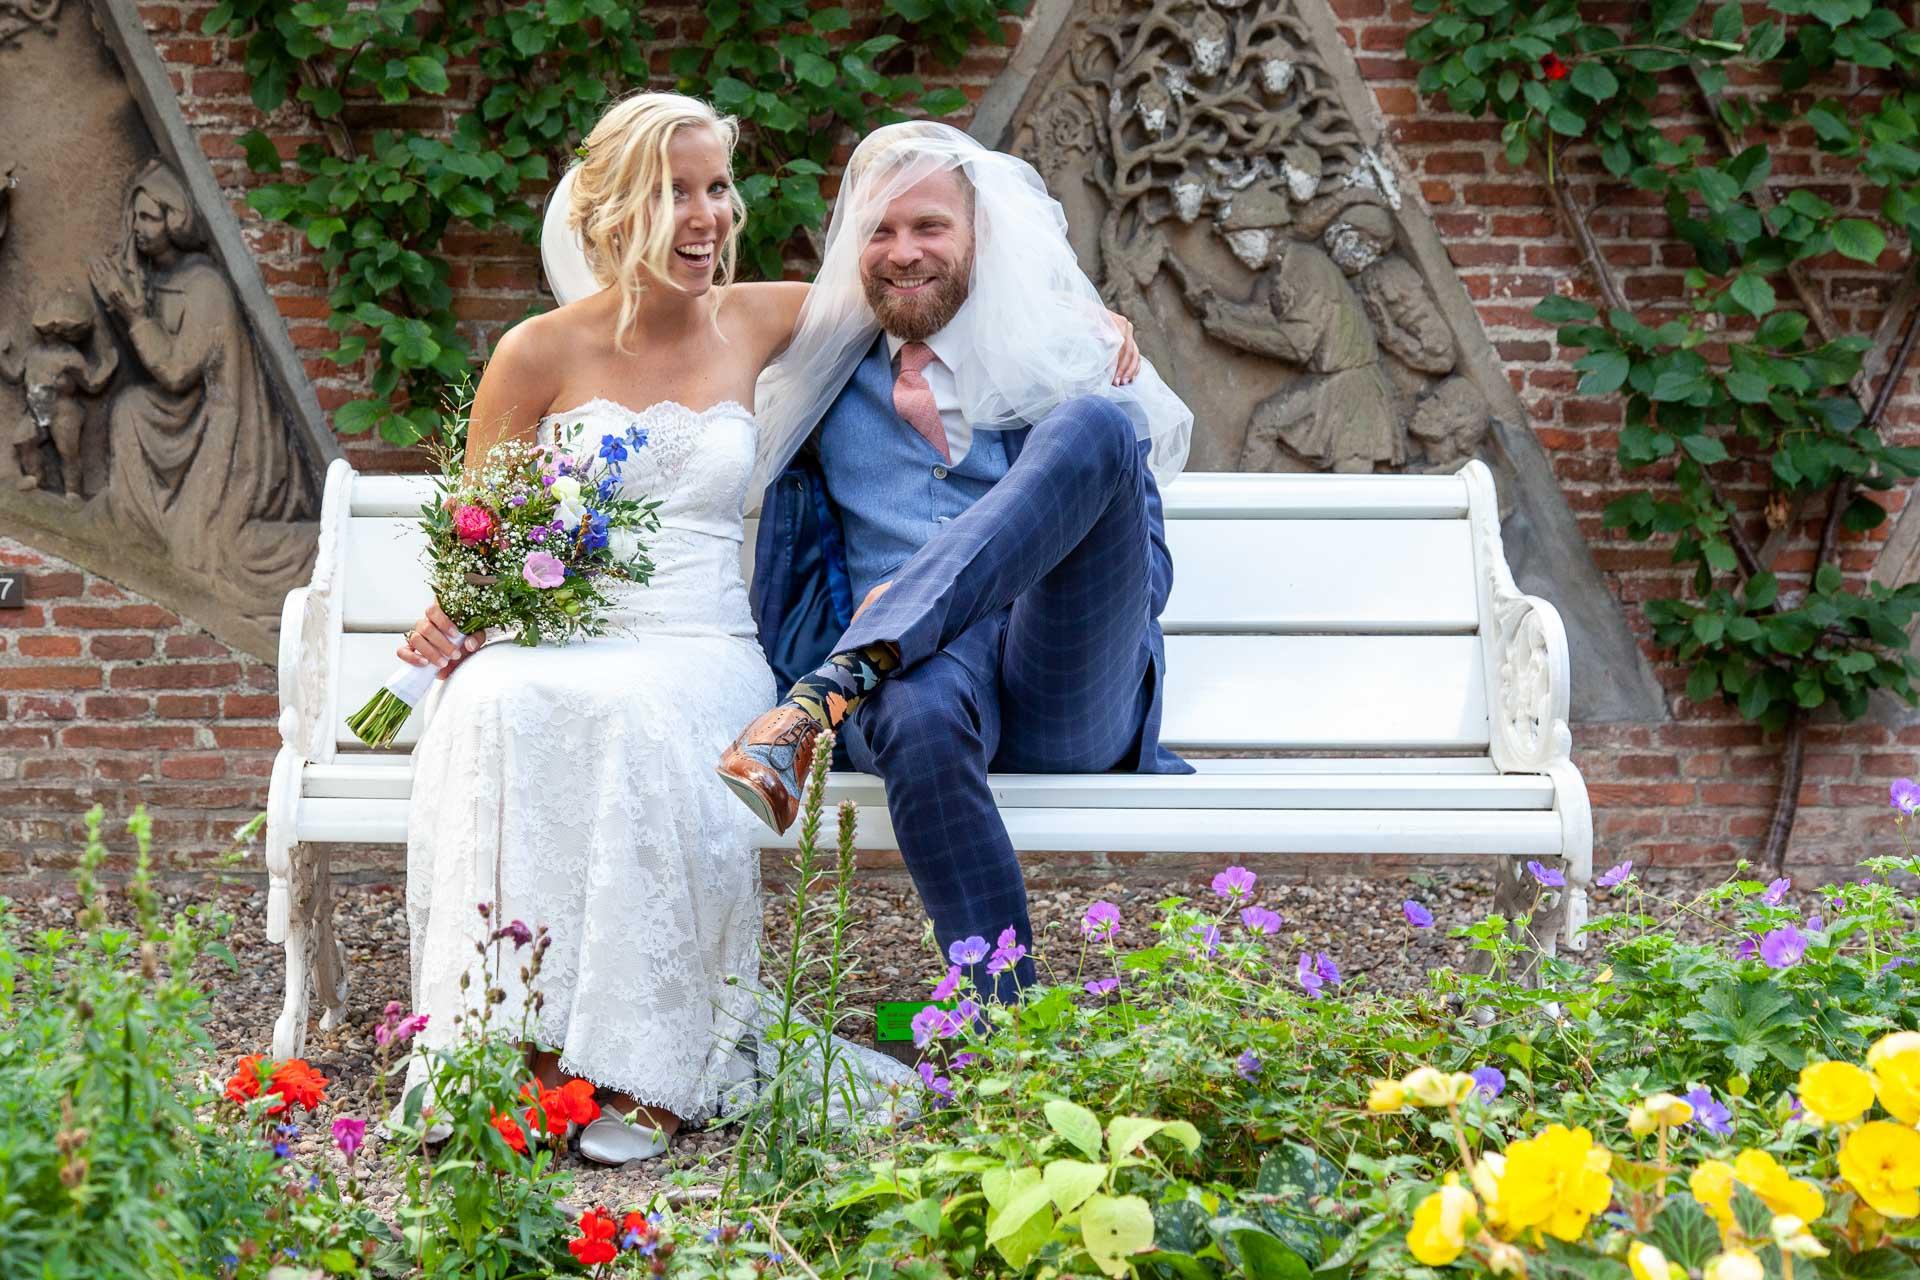 bruidsreportage, bruiloft, huwelijksfotograaf, fotograaf, ludiek, fotoshoot, fotograaf